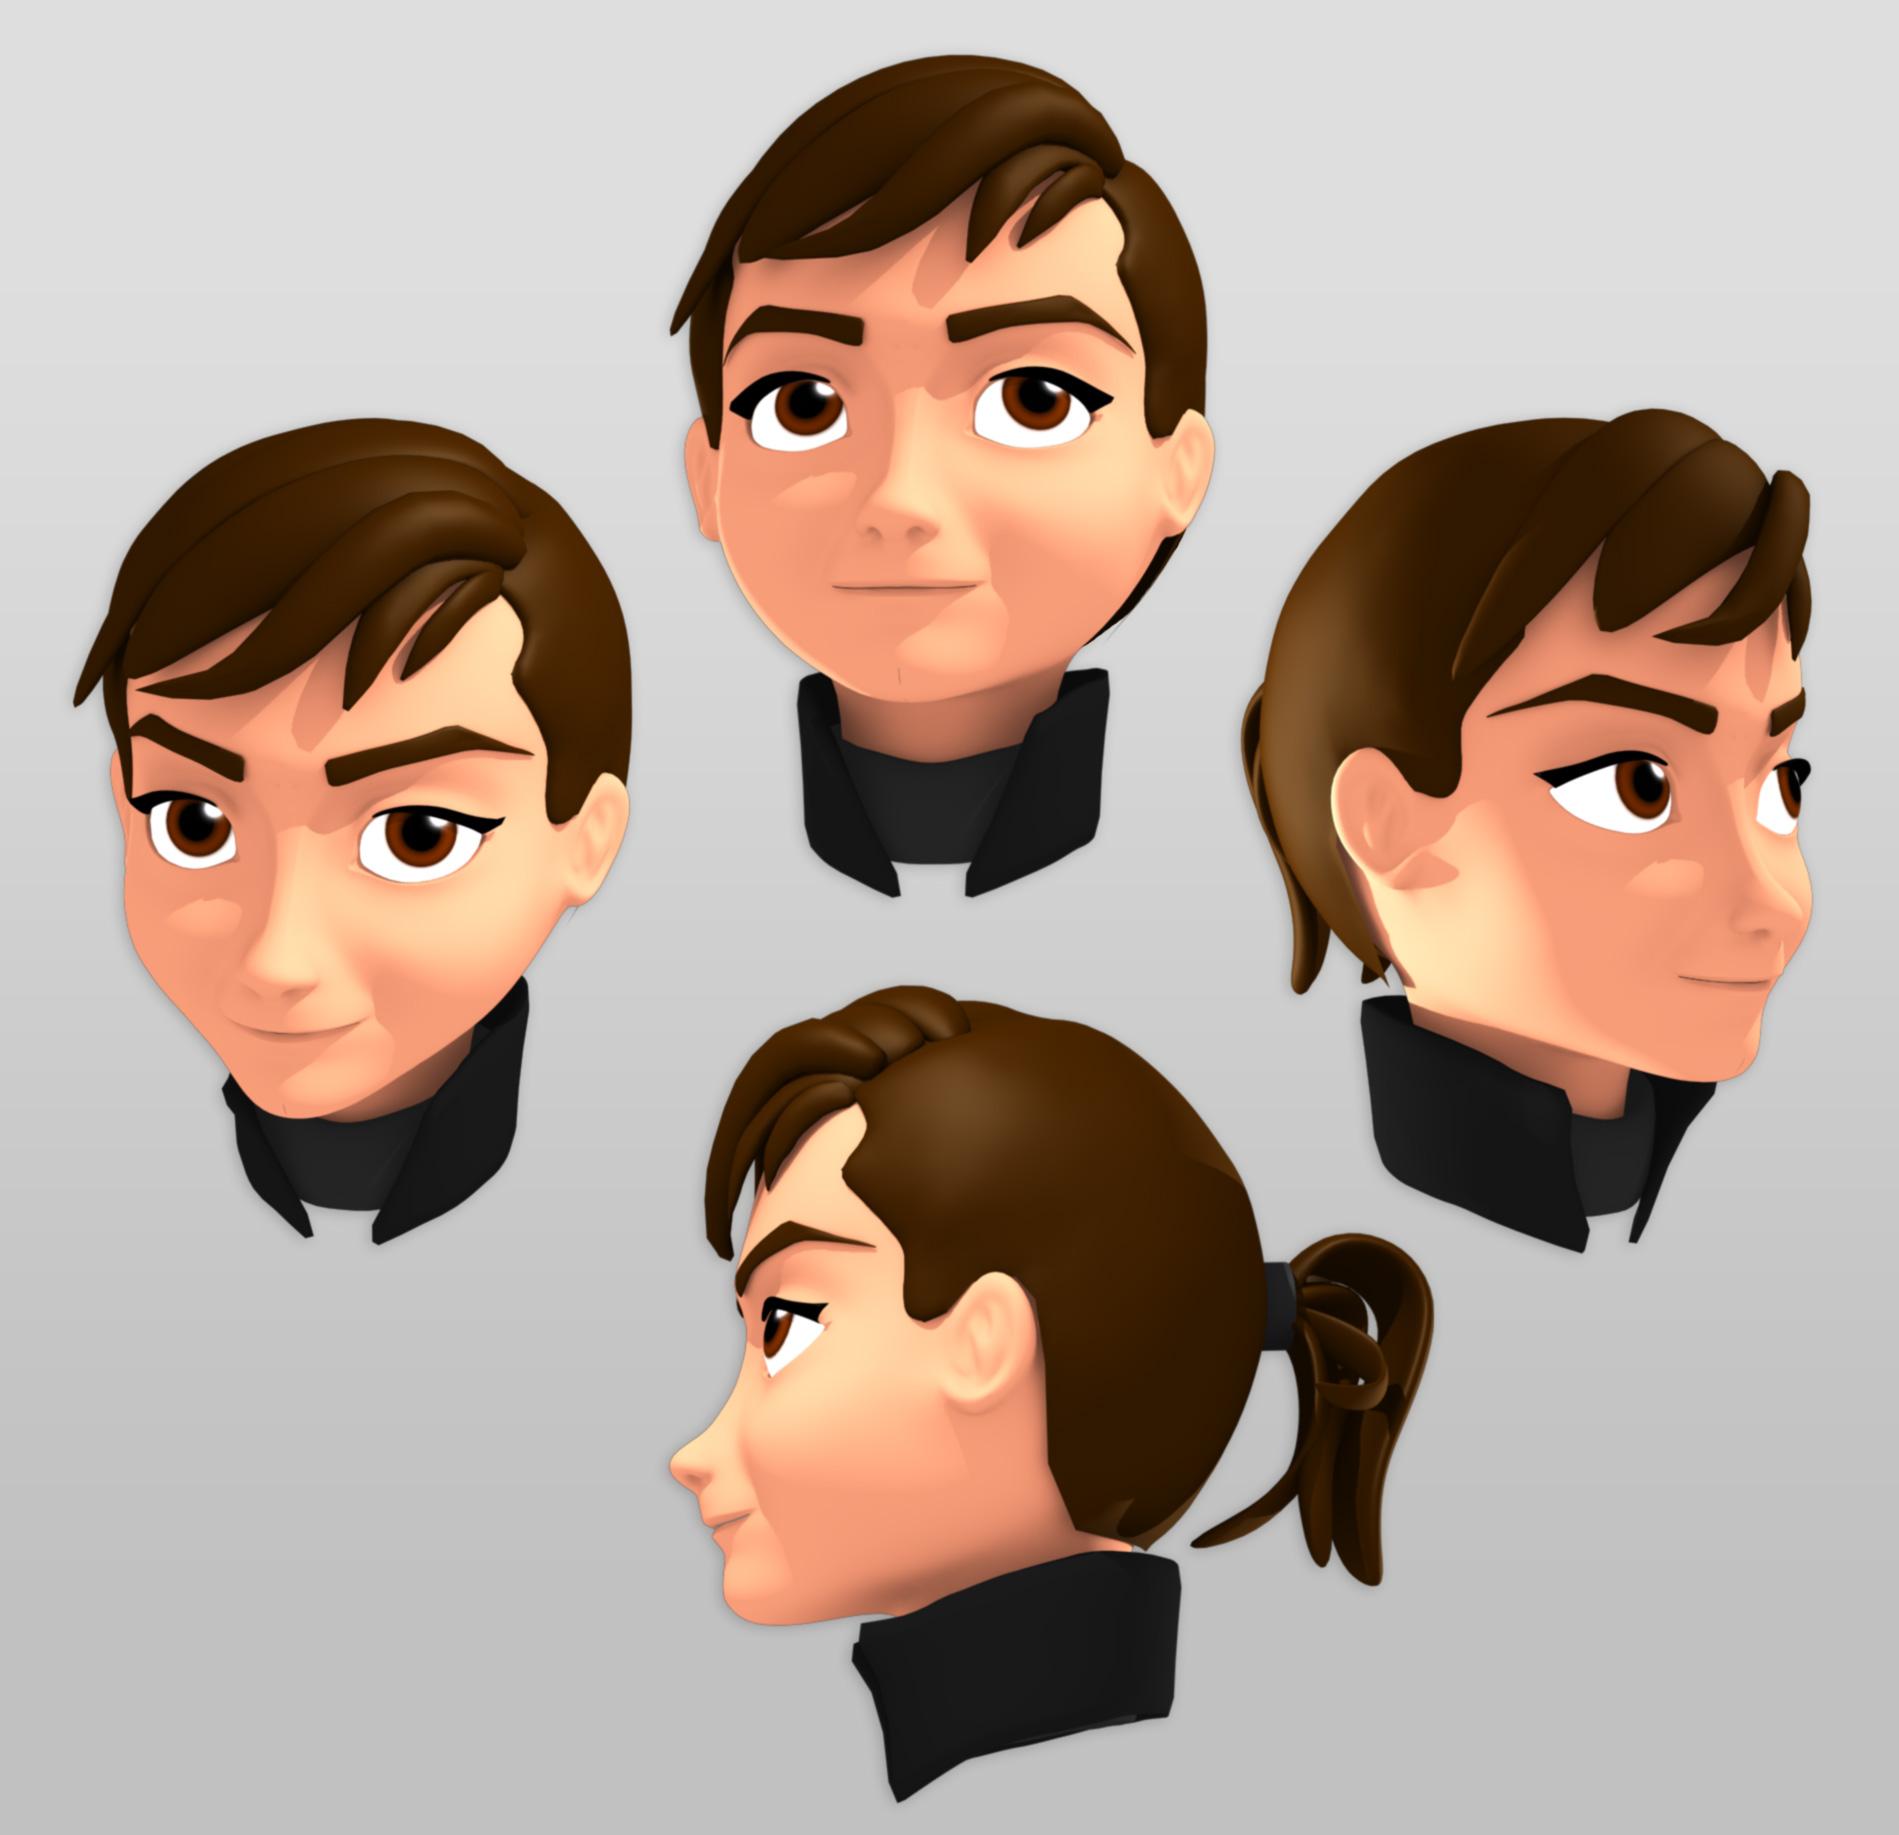 disney_styled_character_by_yuliuskrisna-d7j20y5.jpg